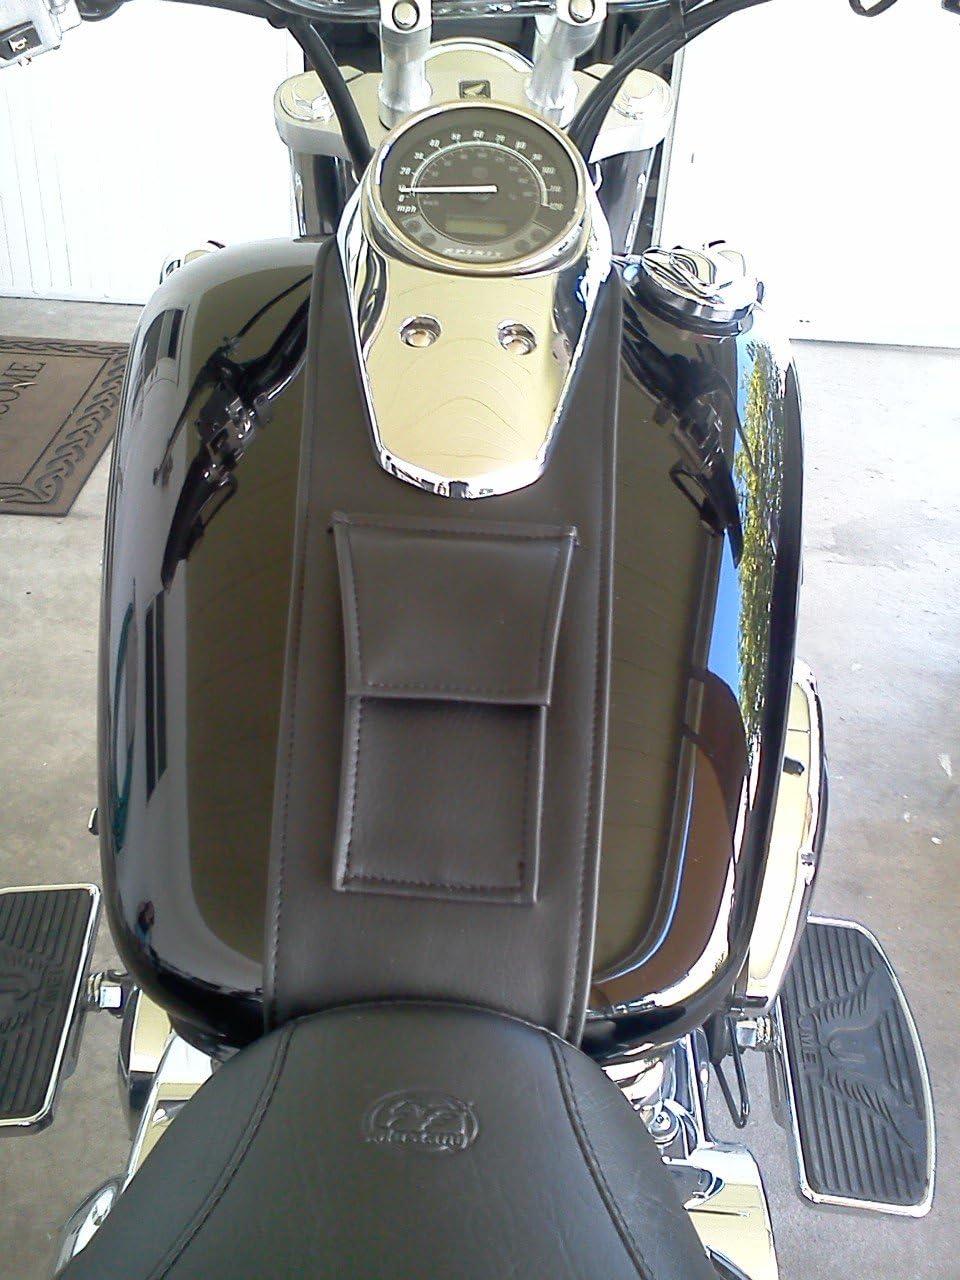 PH Customs Tank Bib Compatible with Honda Shadow VT750 750 Spirit C2 Phantom with POCKET